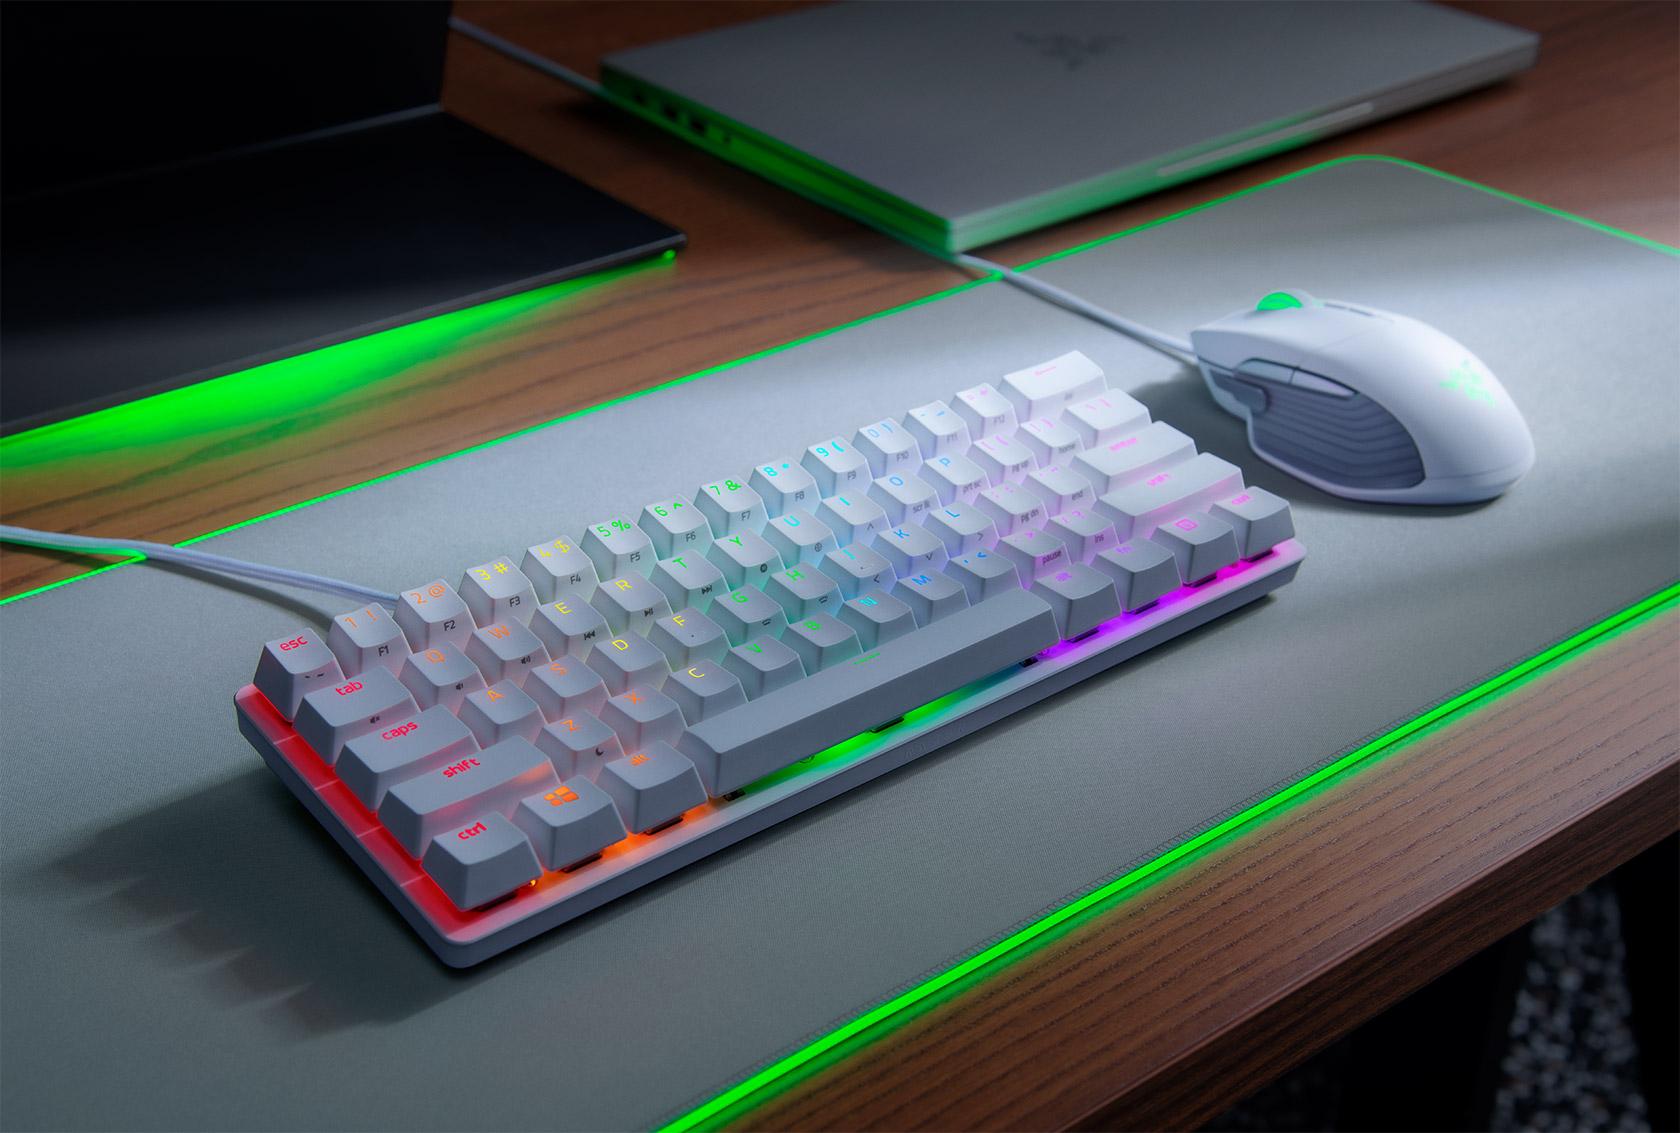 Razer Huntsman Mini Computer Keyboard